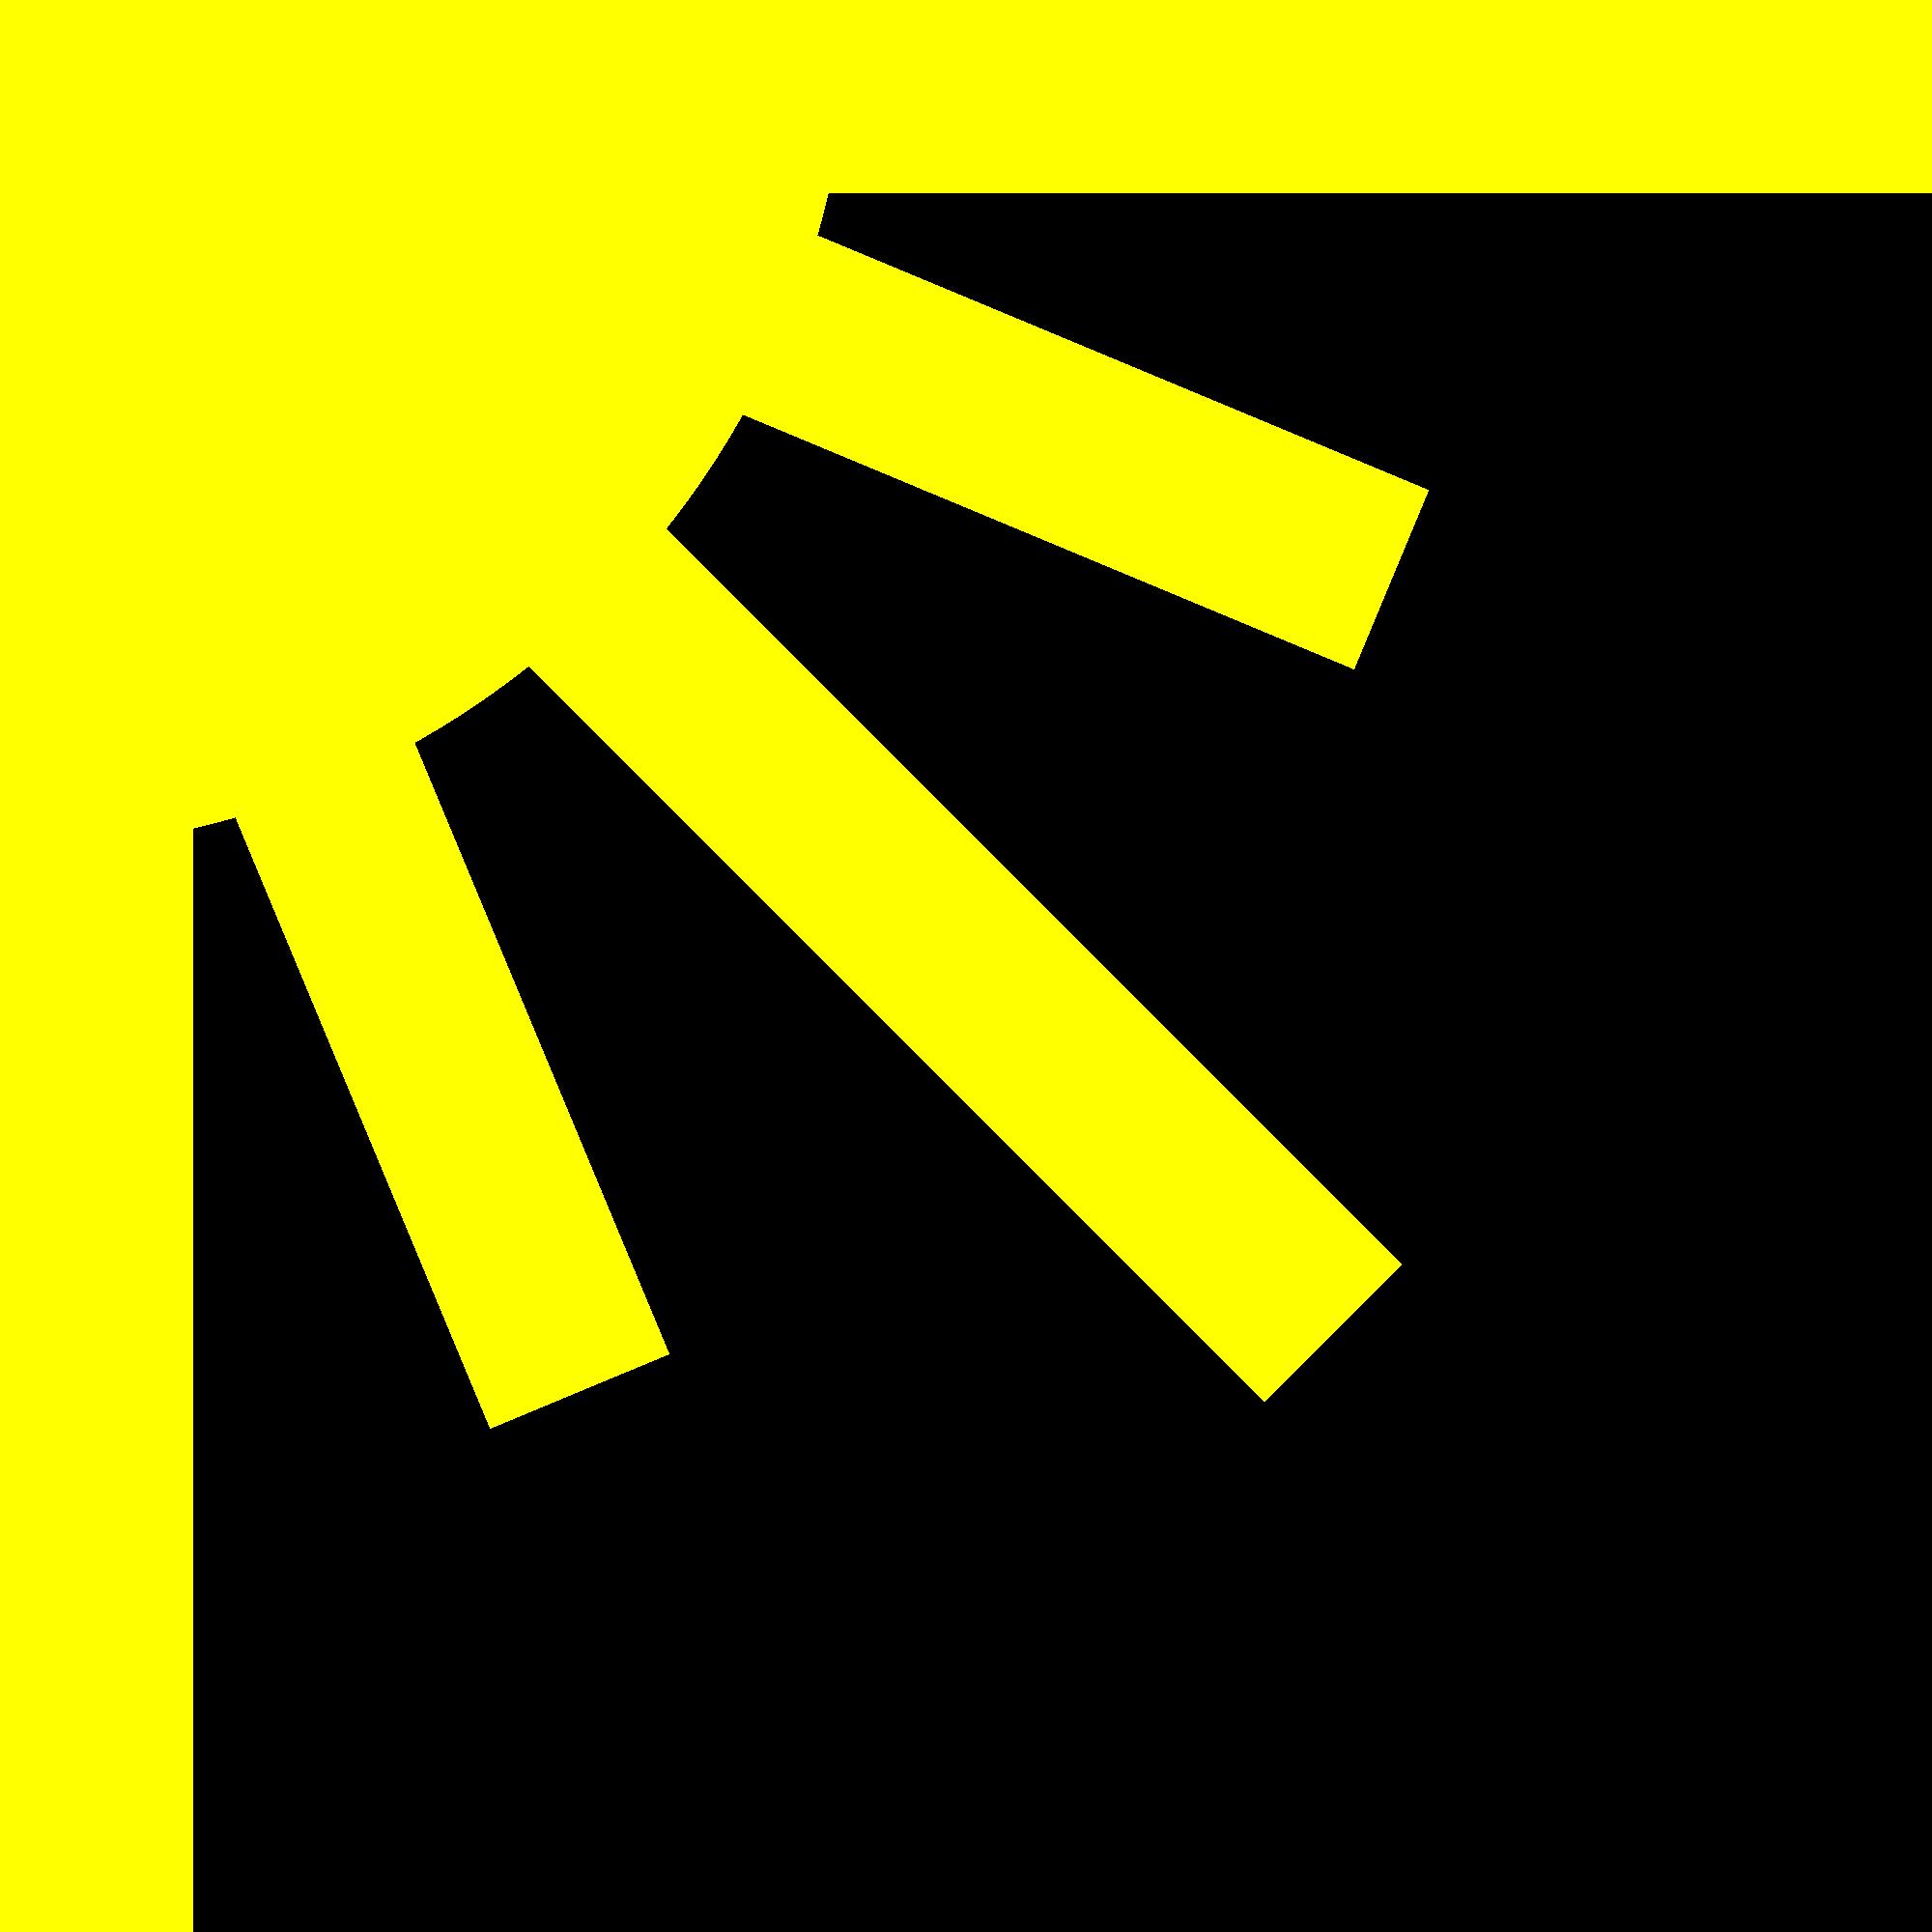 Corner sun clipart image free stock File:Sun corner.svg - Wikimedia Commons image free stock